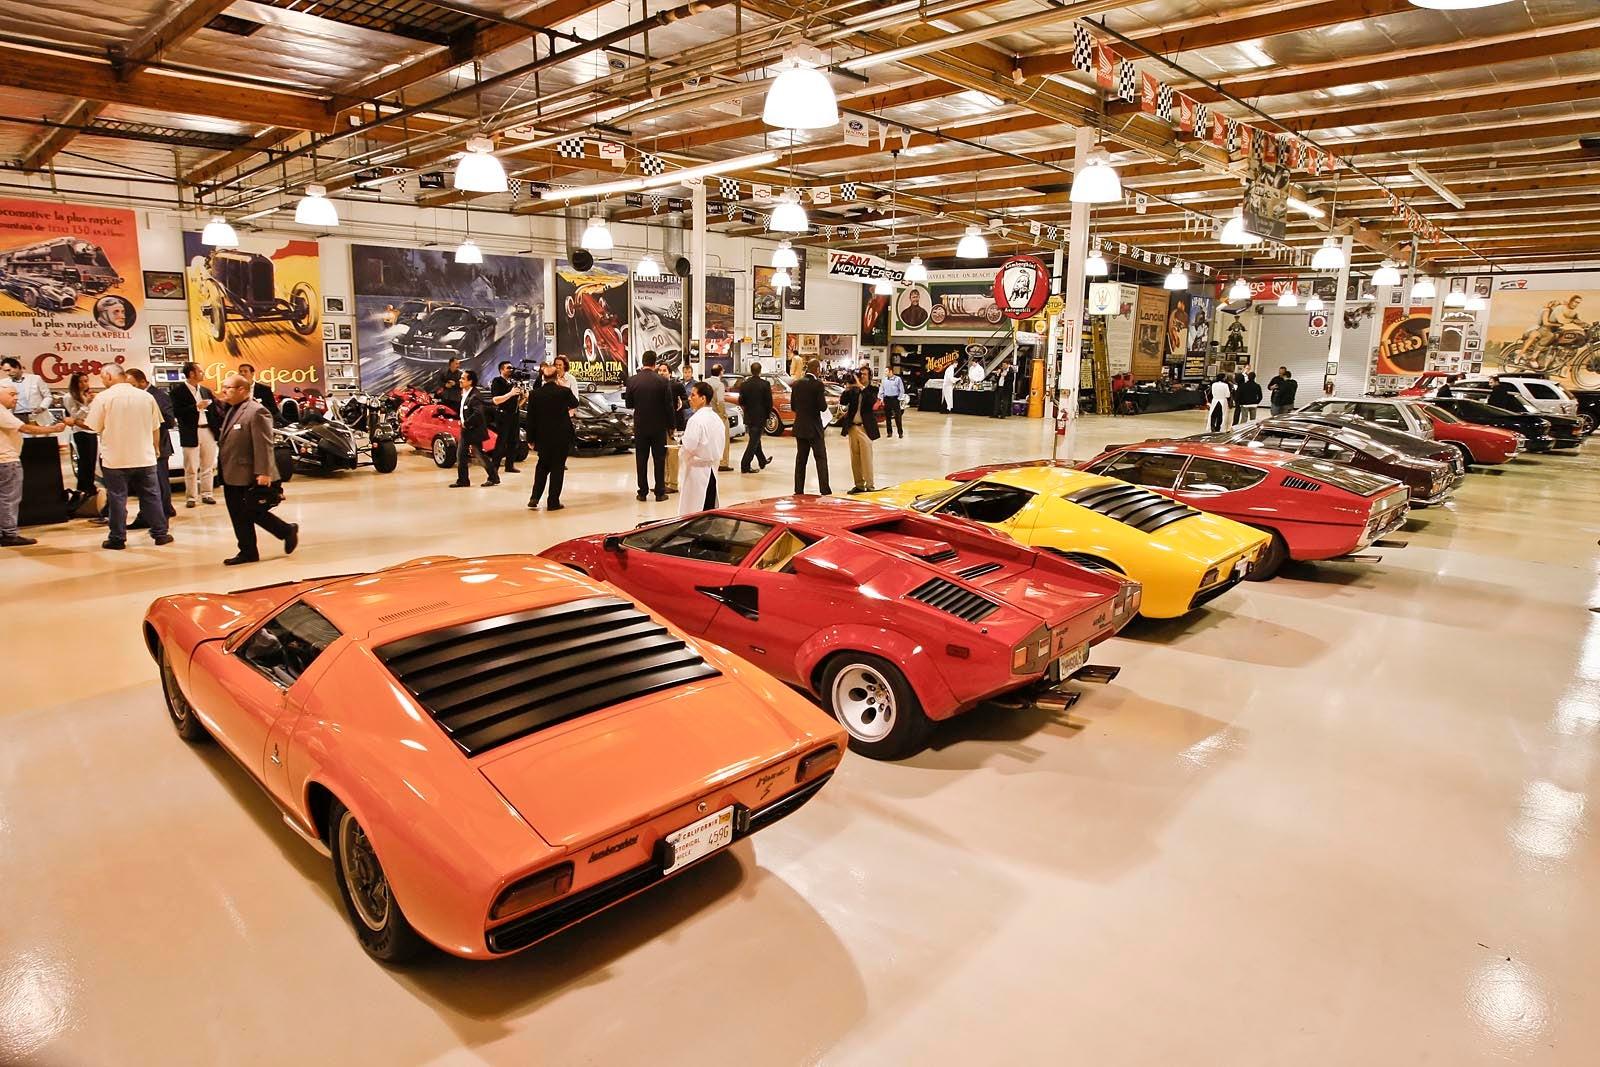 Burbank Envy A Glimpse Inside Jay Leno S Garage